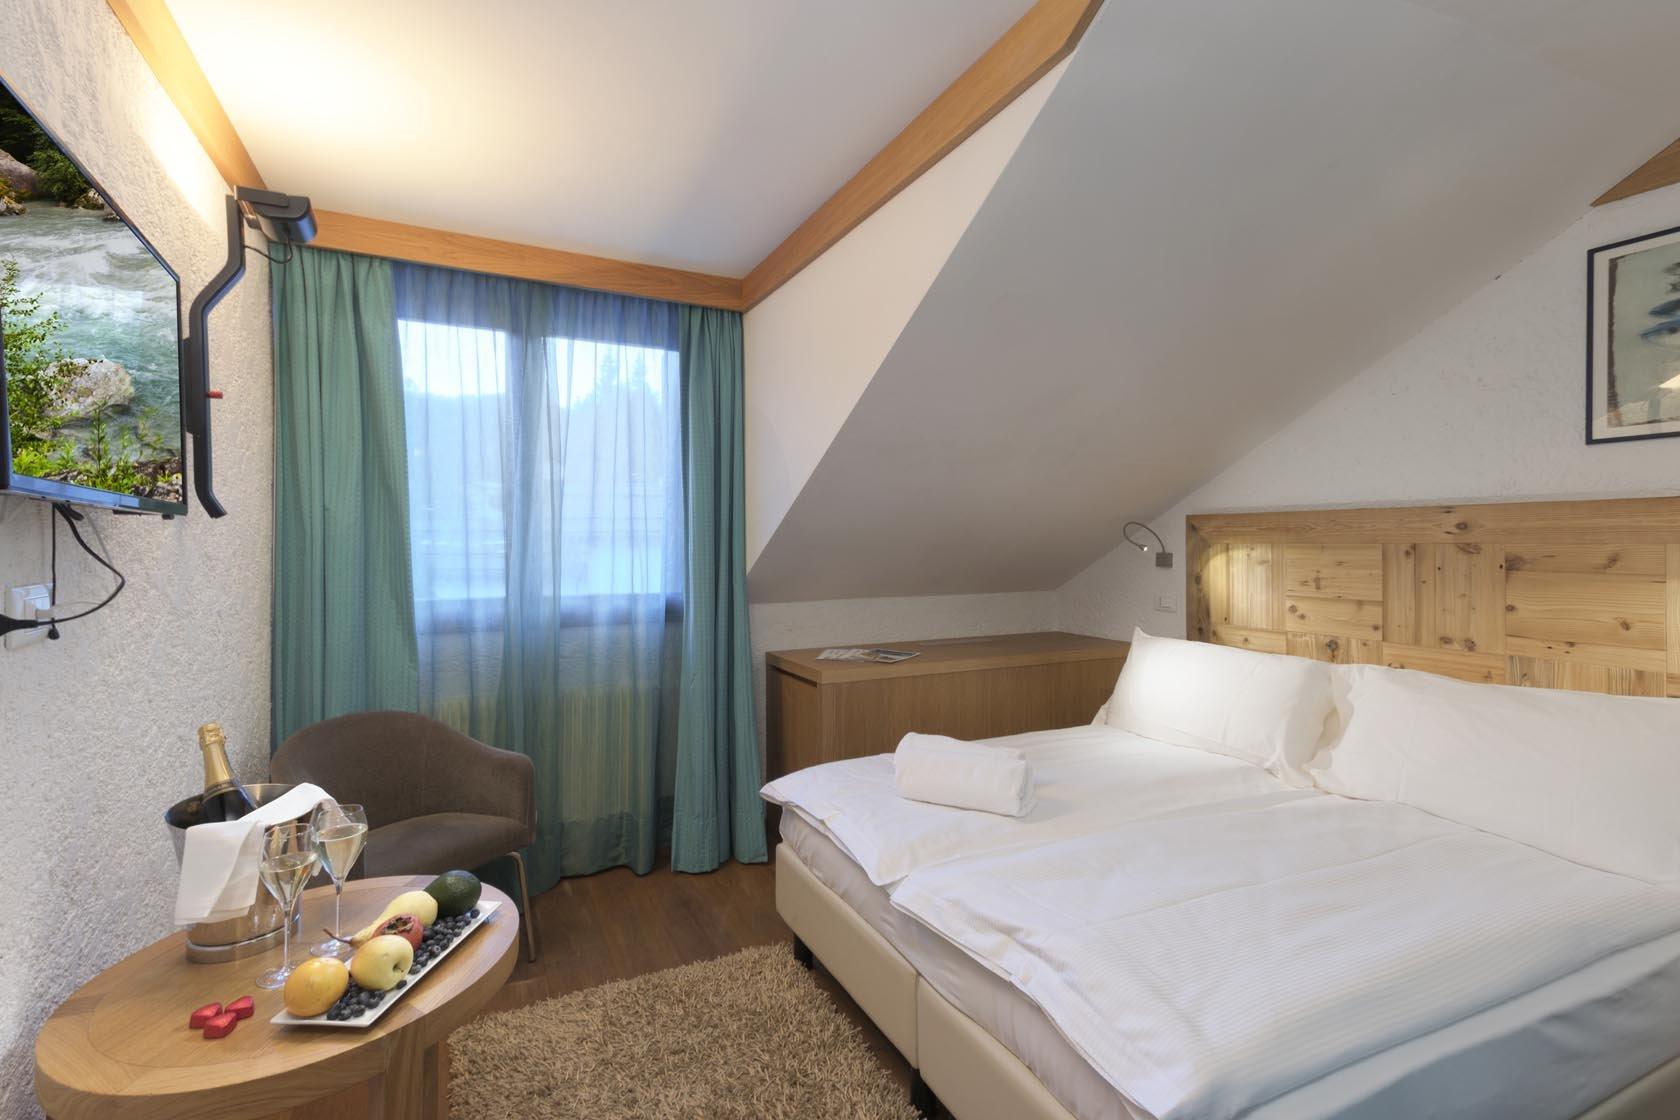 Grifone Hotel - Una camera